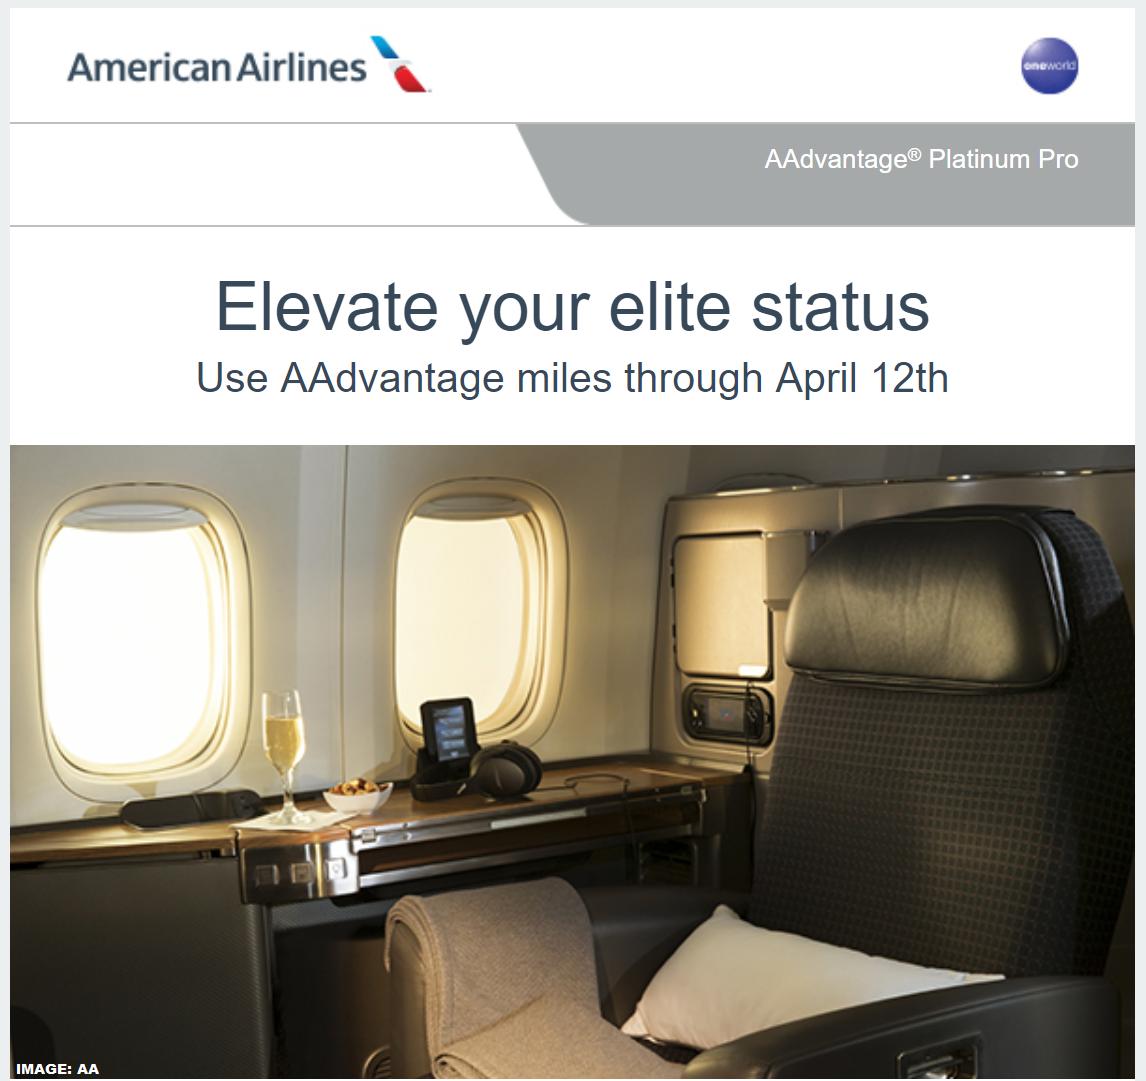 3k Or 300k Miles To Elevate American Airlines Status